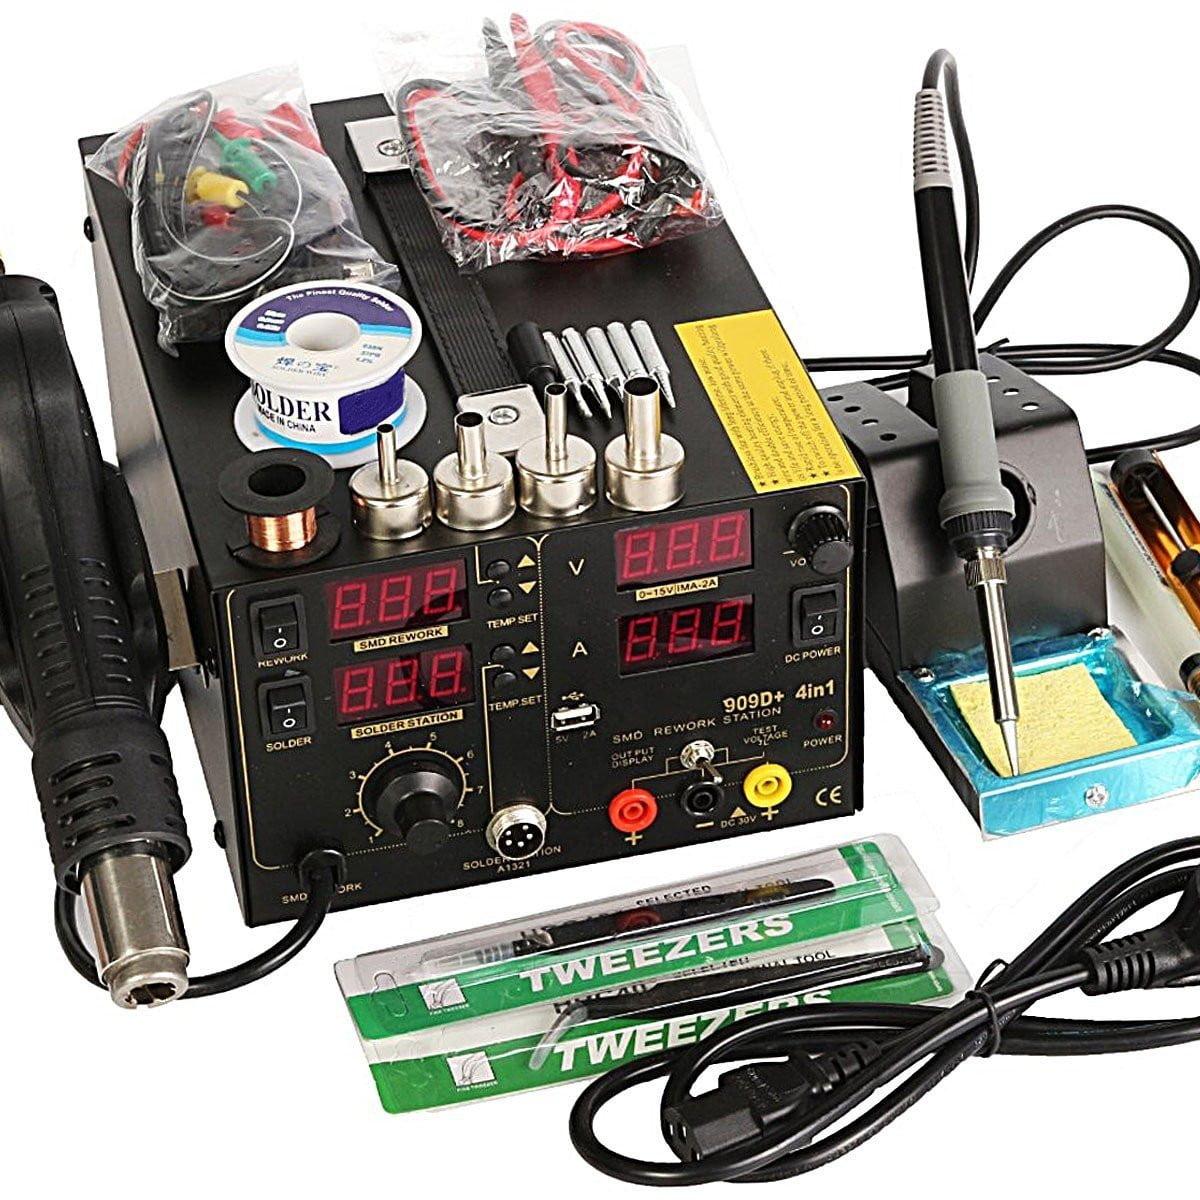 909D+ 4 in1 Rework Soldering Station Hot Heat Air Gun DC USB Power Supply Tool 220V AC by